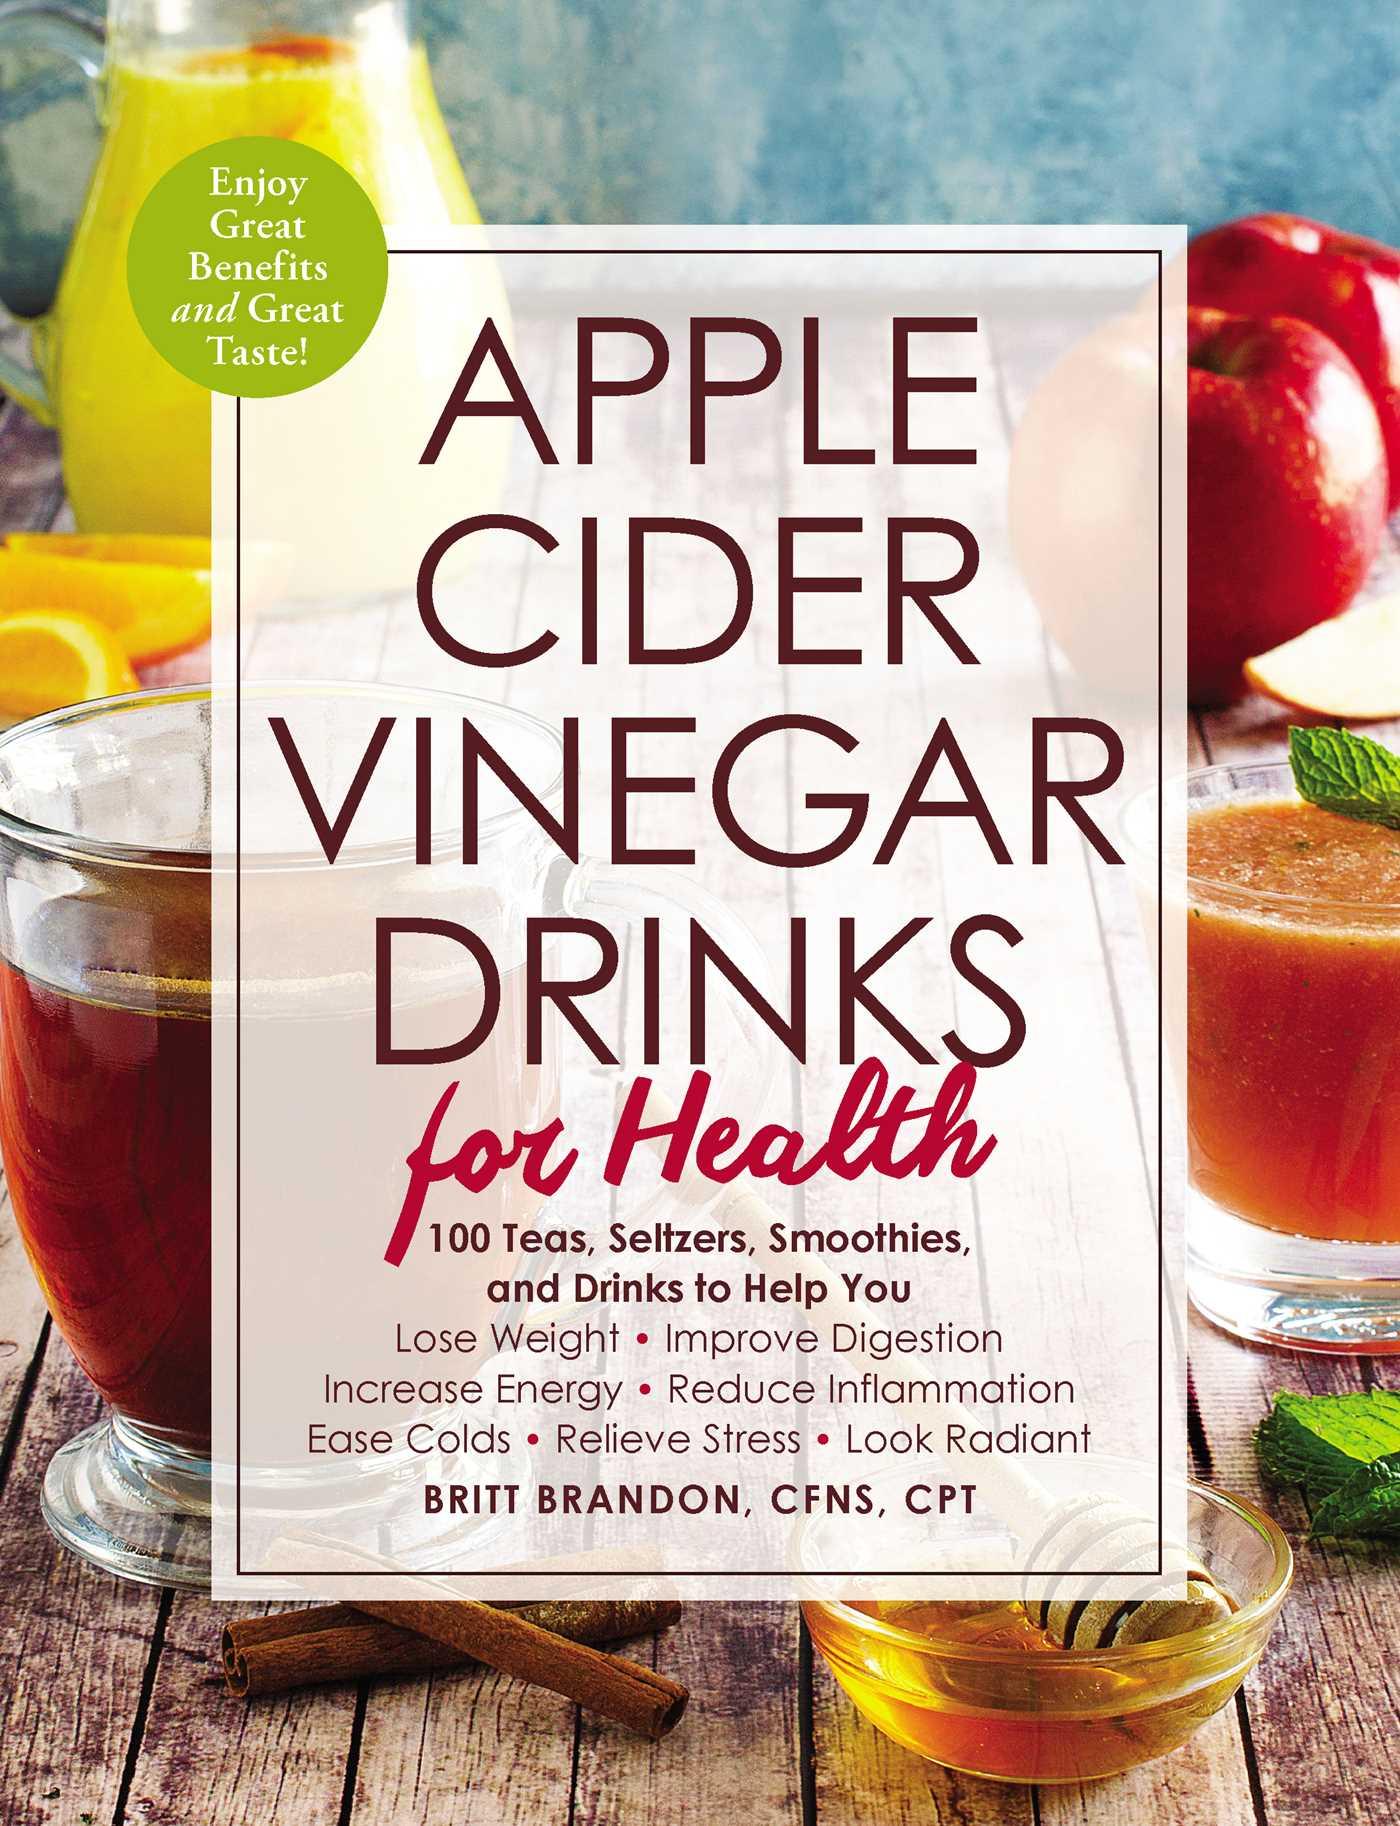 Apple cider vinegar drinks for health 9781507207567 hr